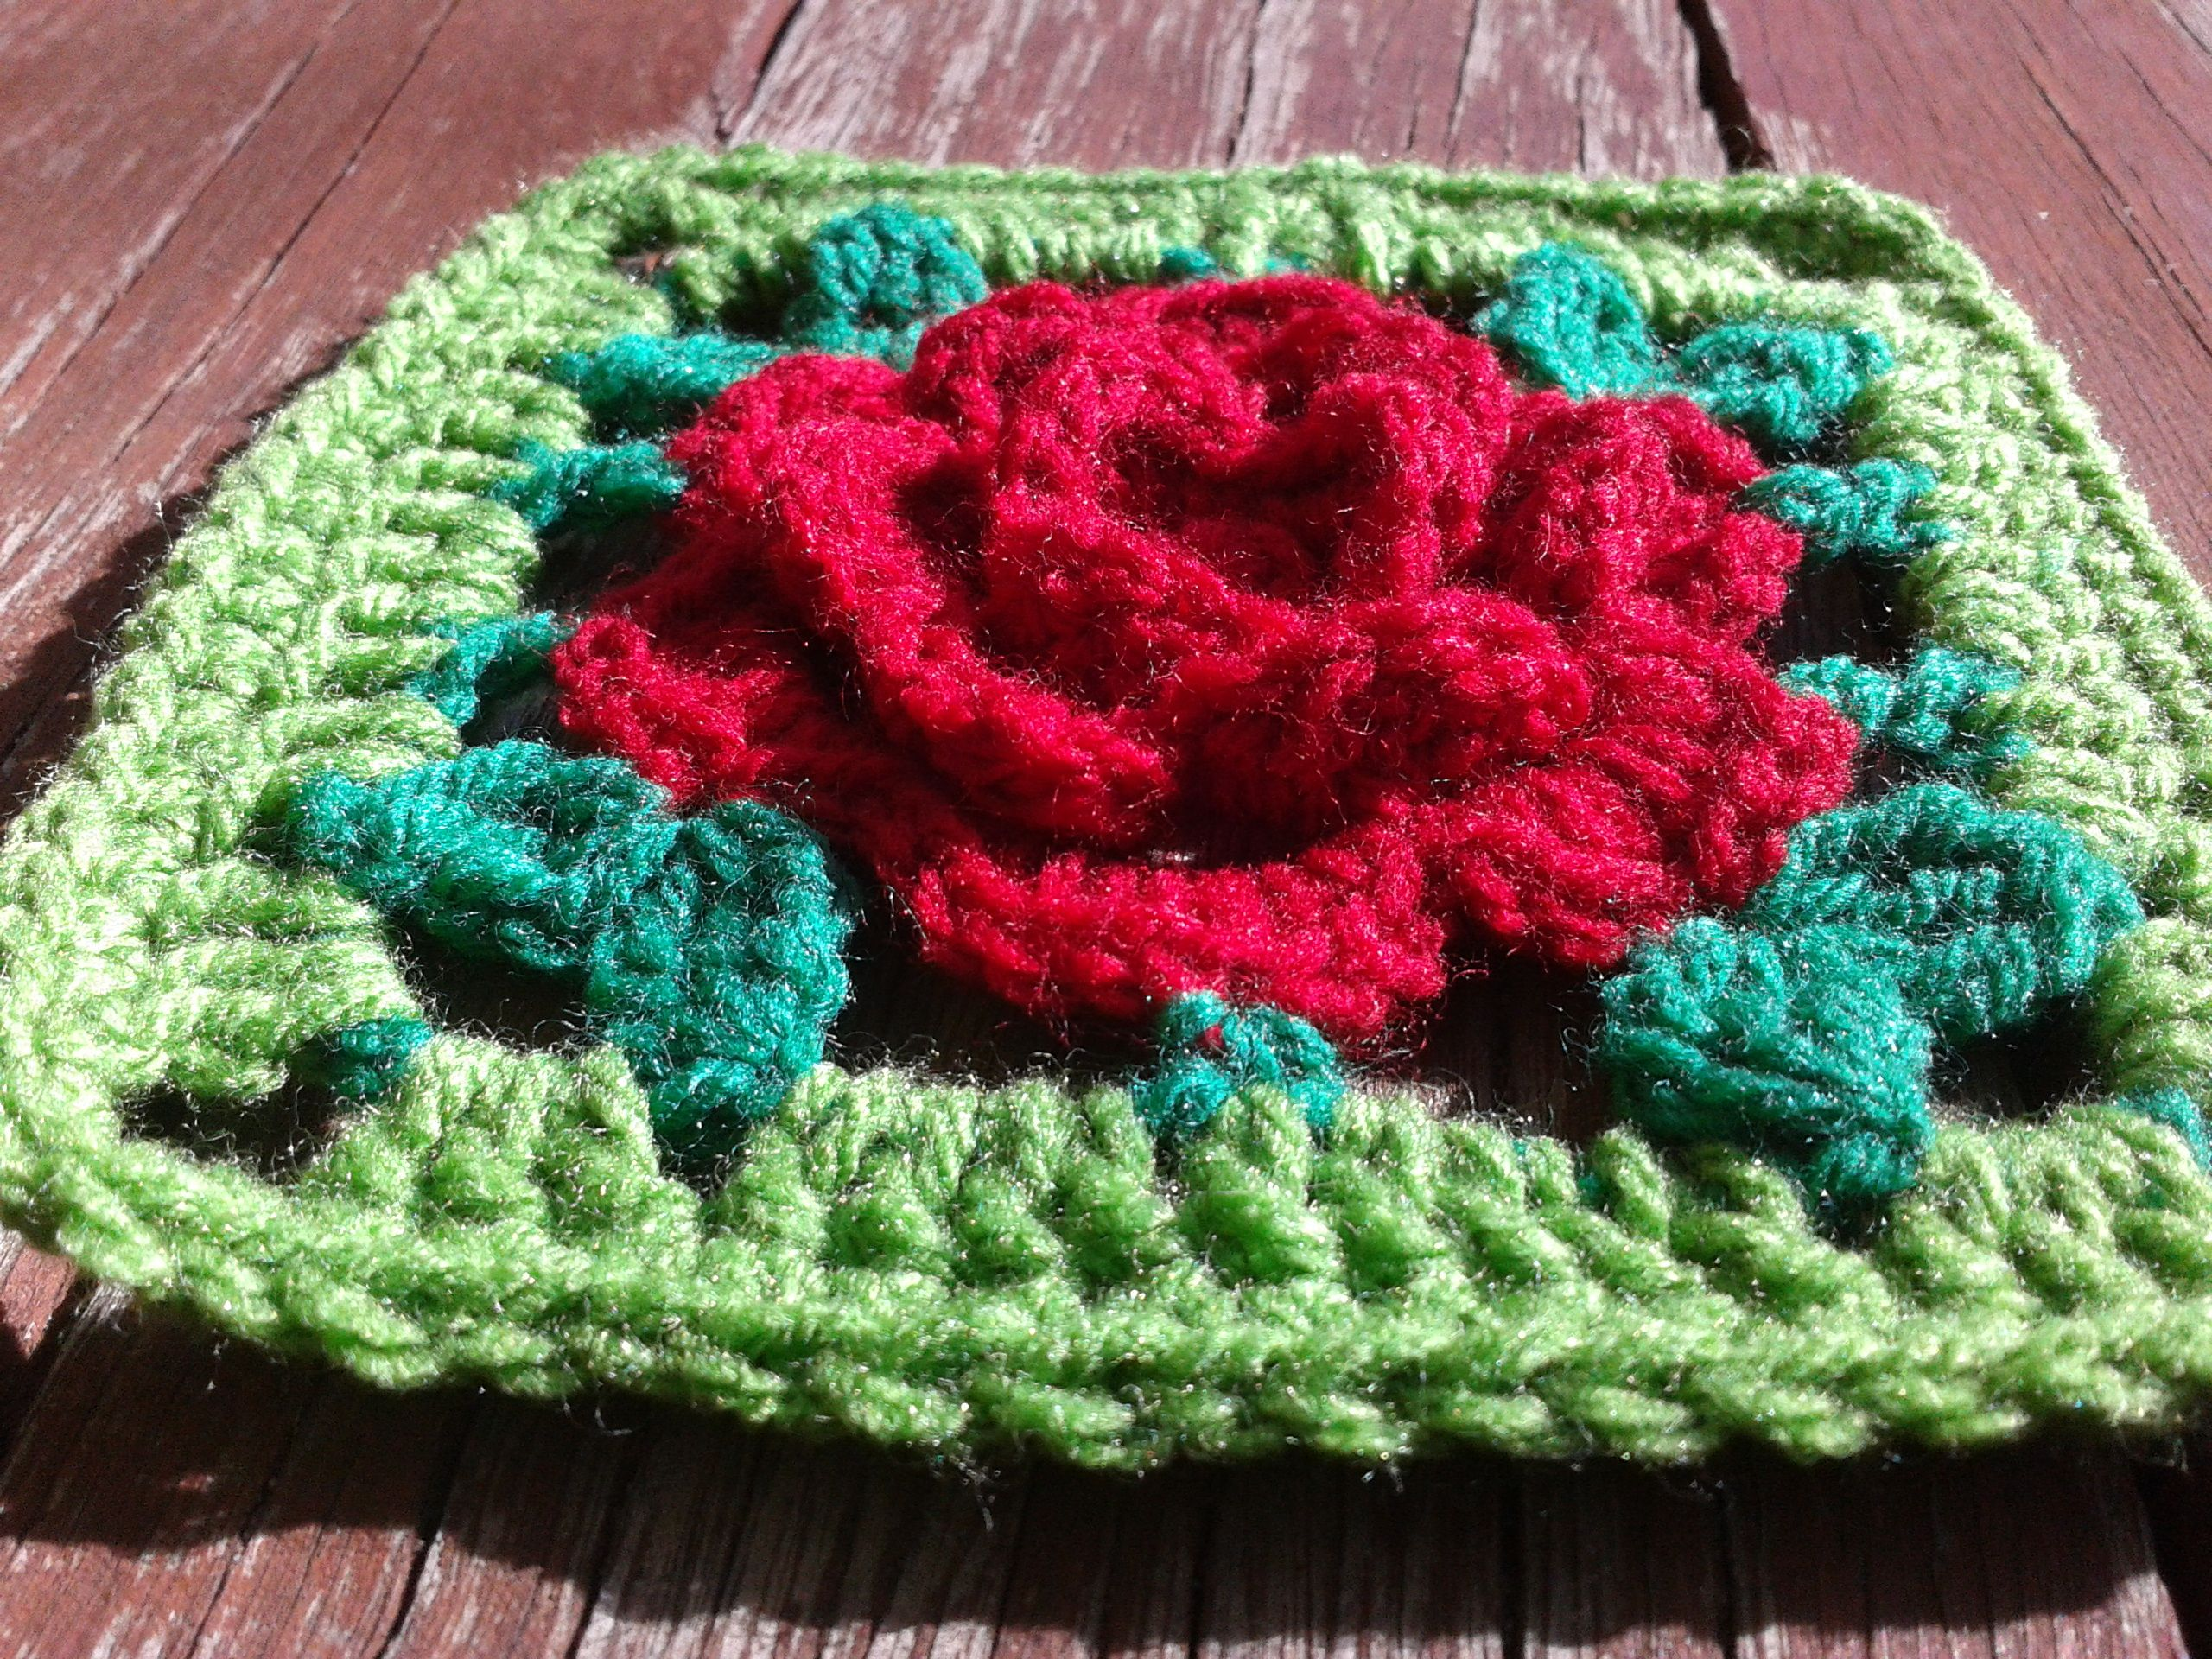 Pin by Linda Davie on Crochet Ive done! Pinterest